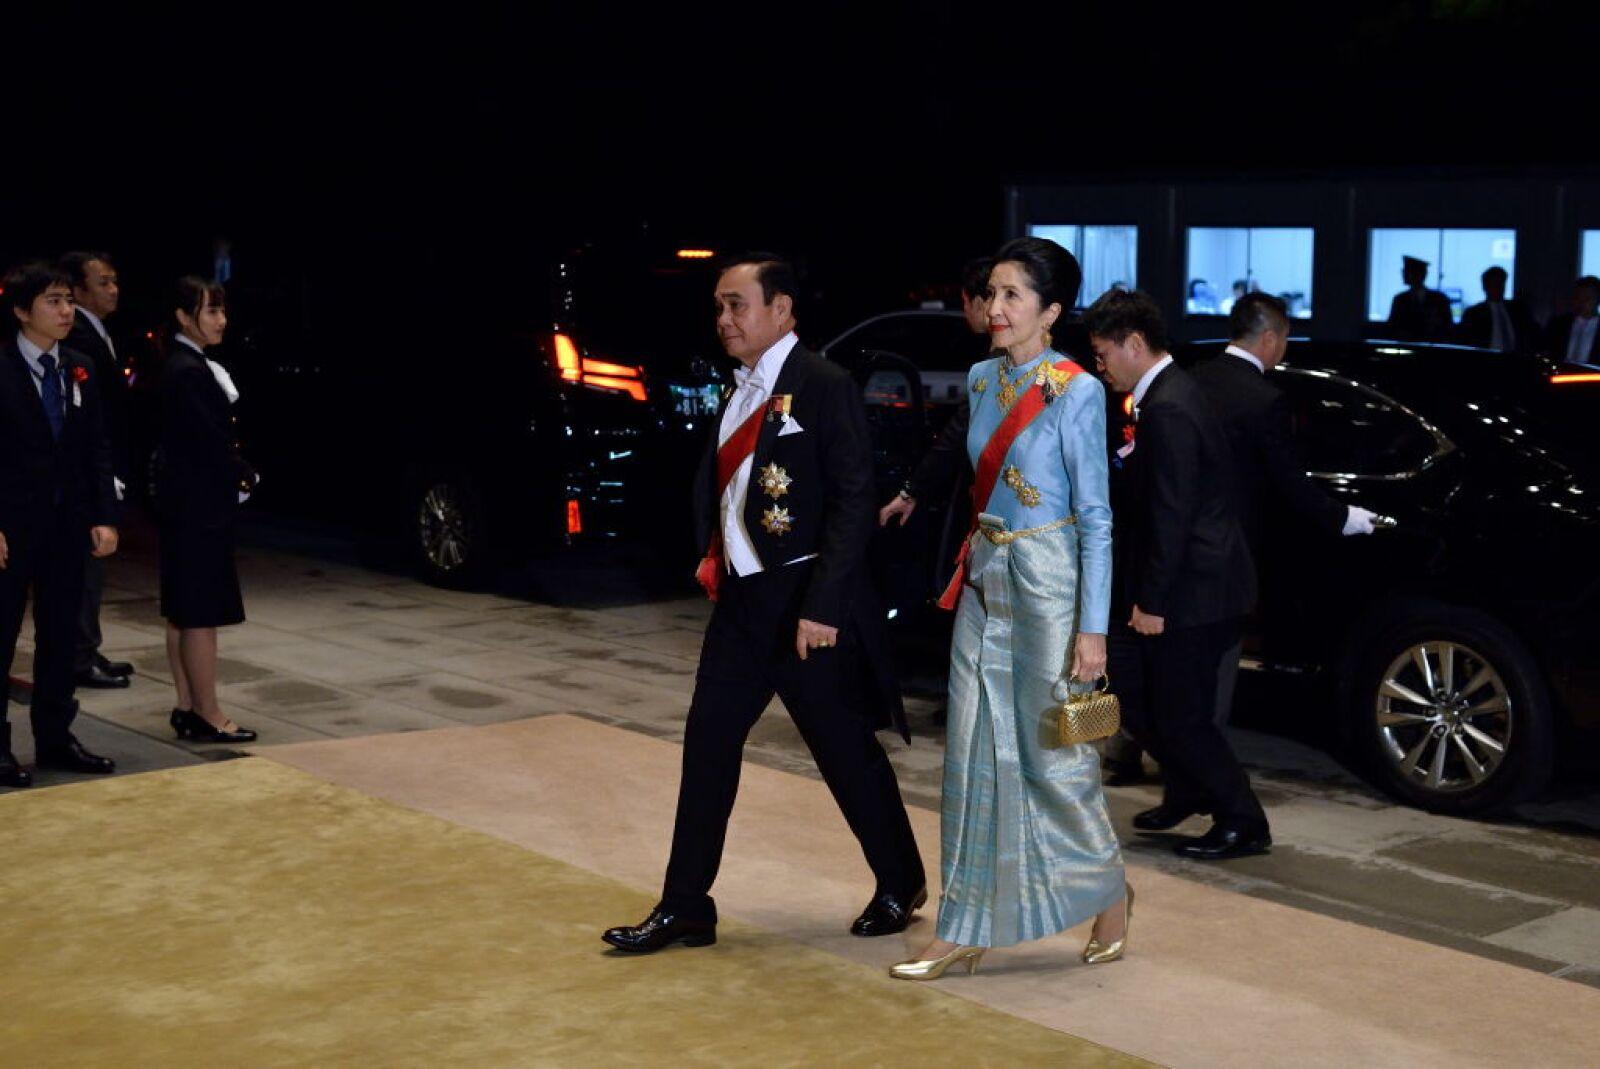 Primer Ministro de Tailandia  Prayut Chan-o-cha, y su esposa, Naraporn Chan-ocha